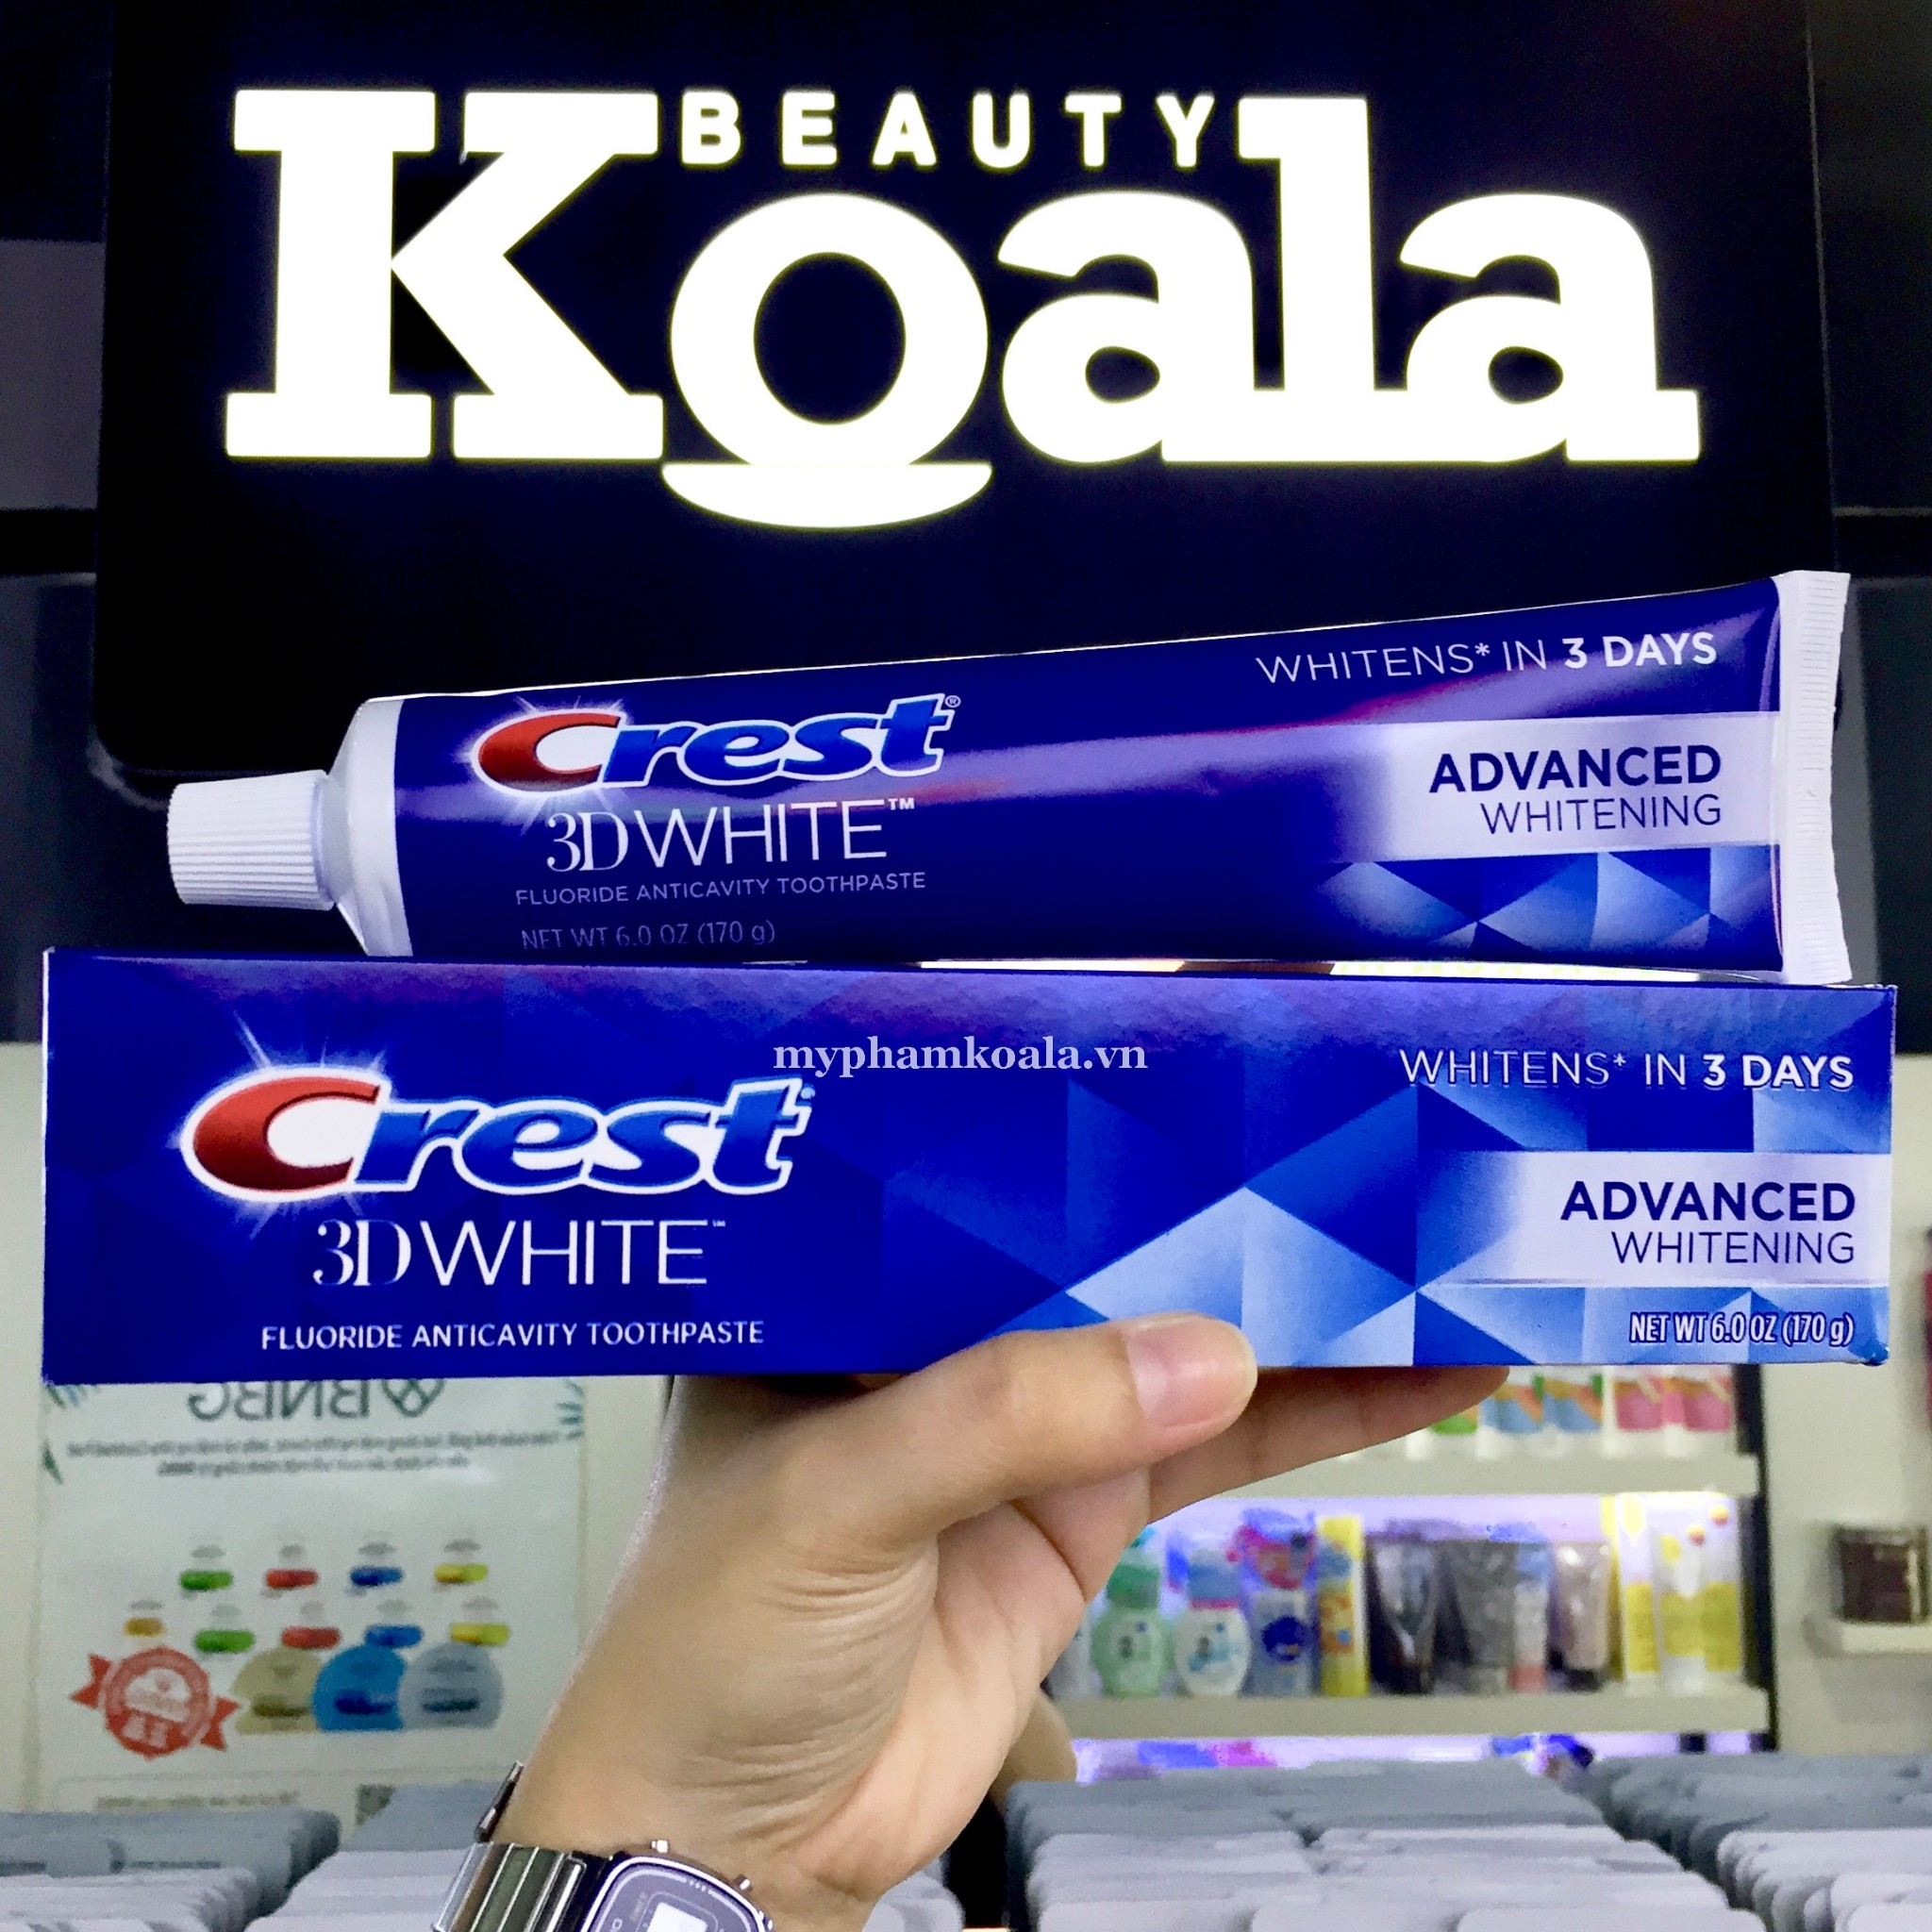 Kem Đánh Trắng Răng Crest 3D White Advanced Whitening Fluoride Anticavity Toothpaste 170gr